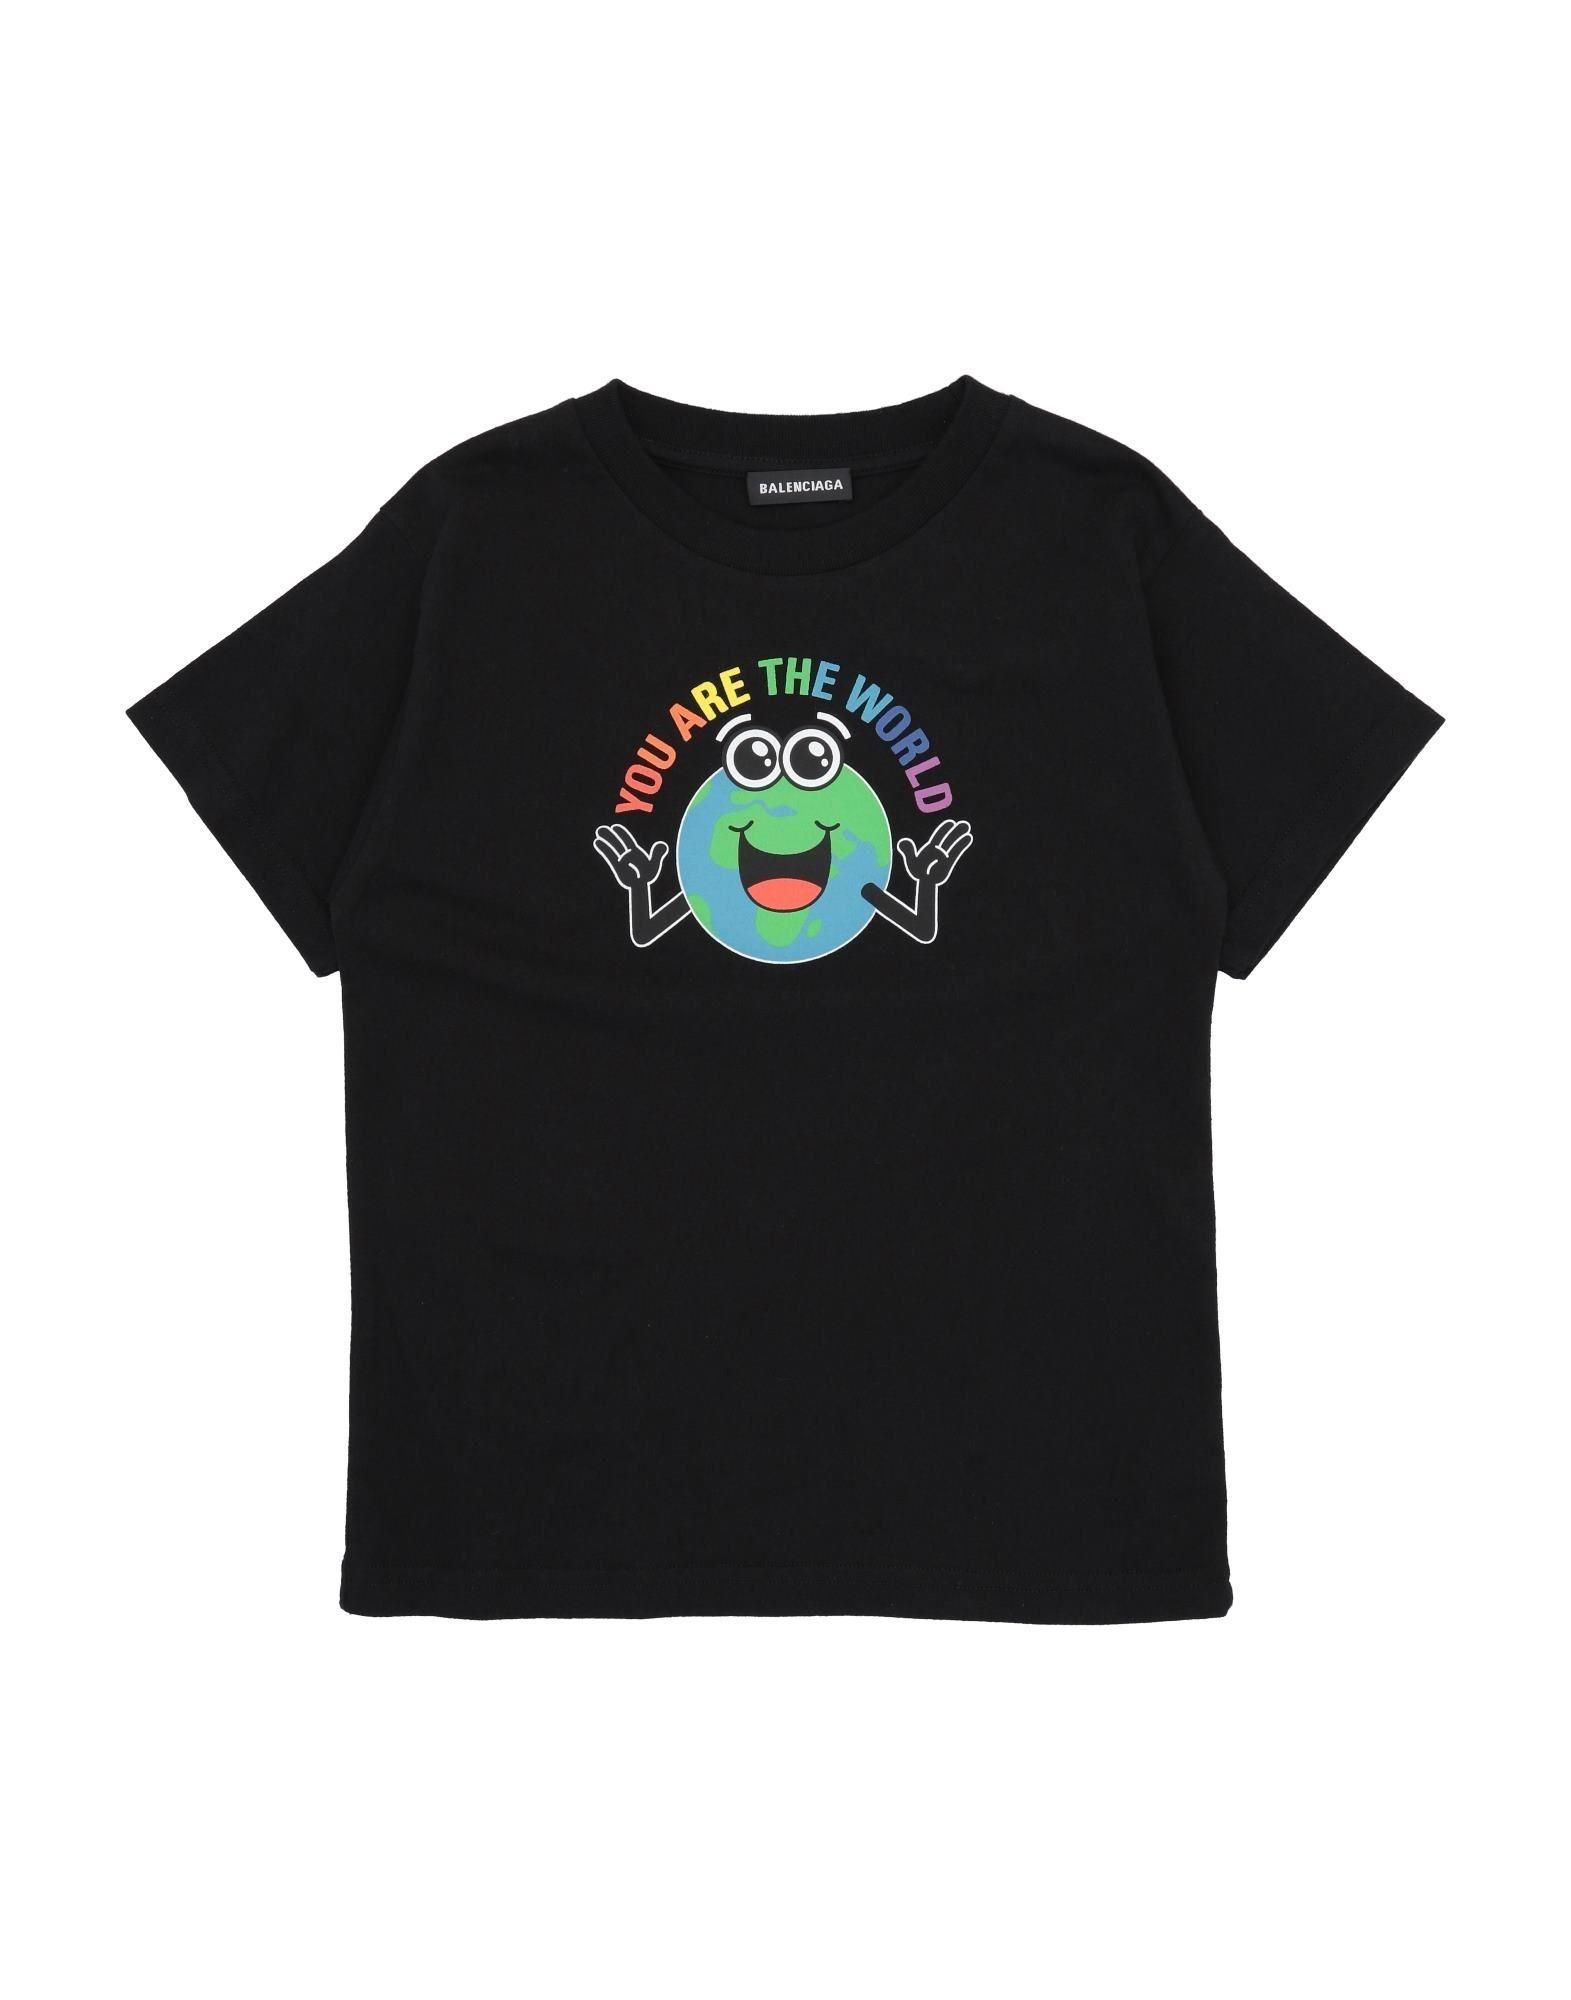 BALENCIAGA KIDS T-shirts - Item 12475603